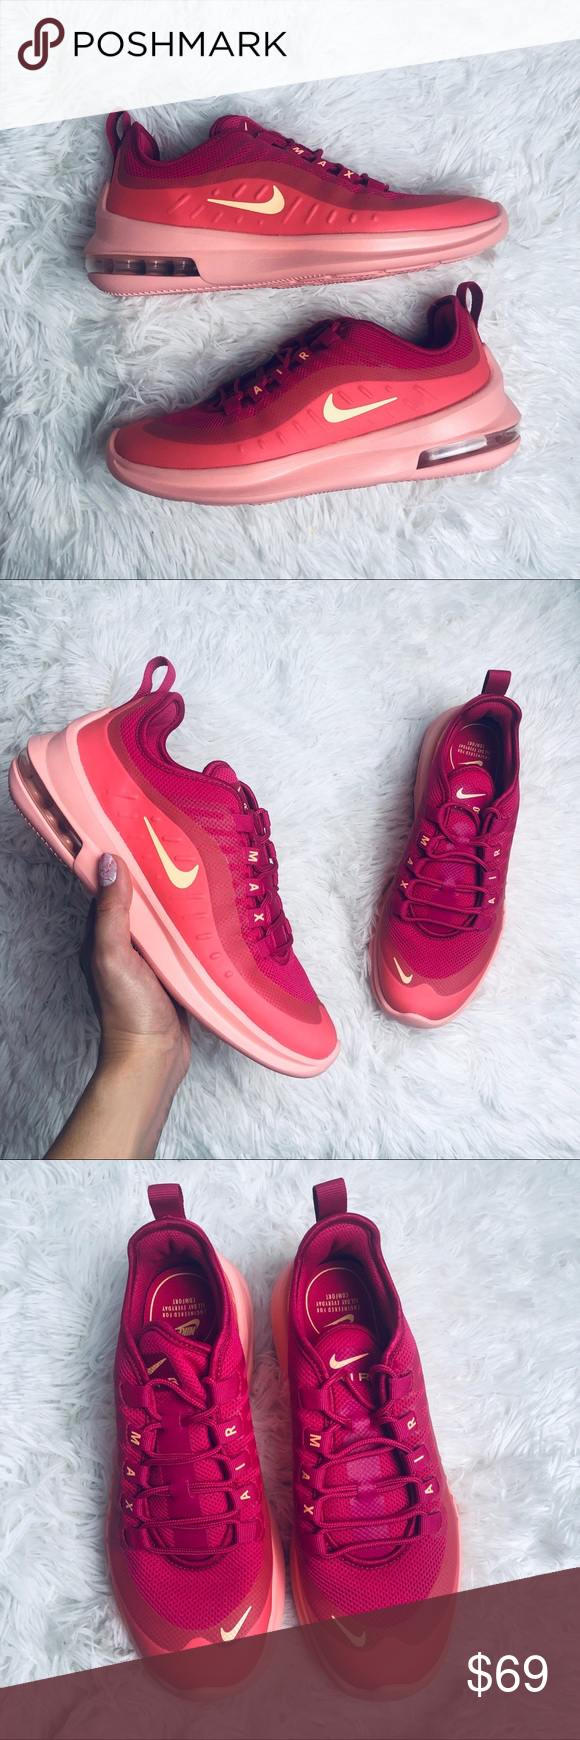 Nike Women's Air Max Axis (Rush Pink | Melon Tint